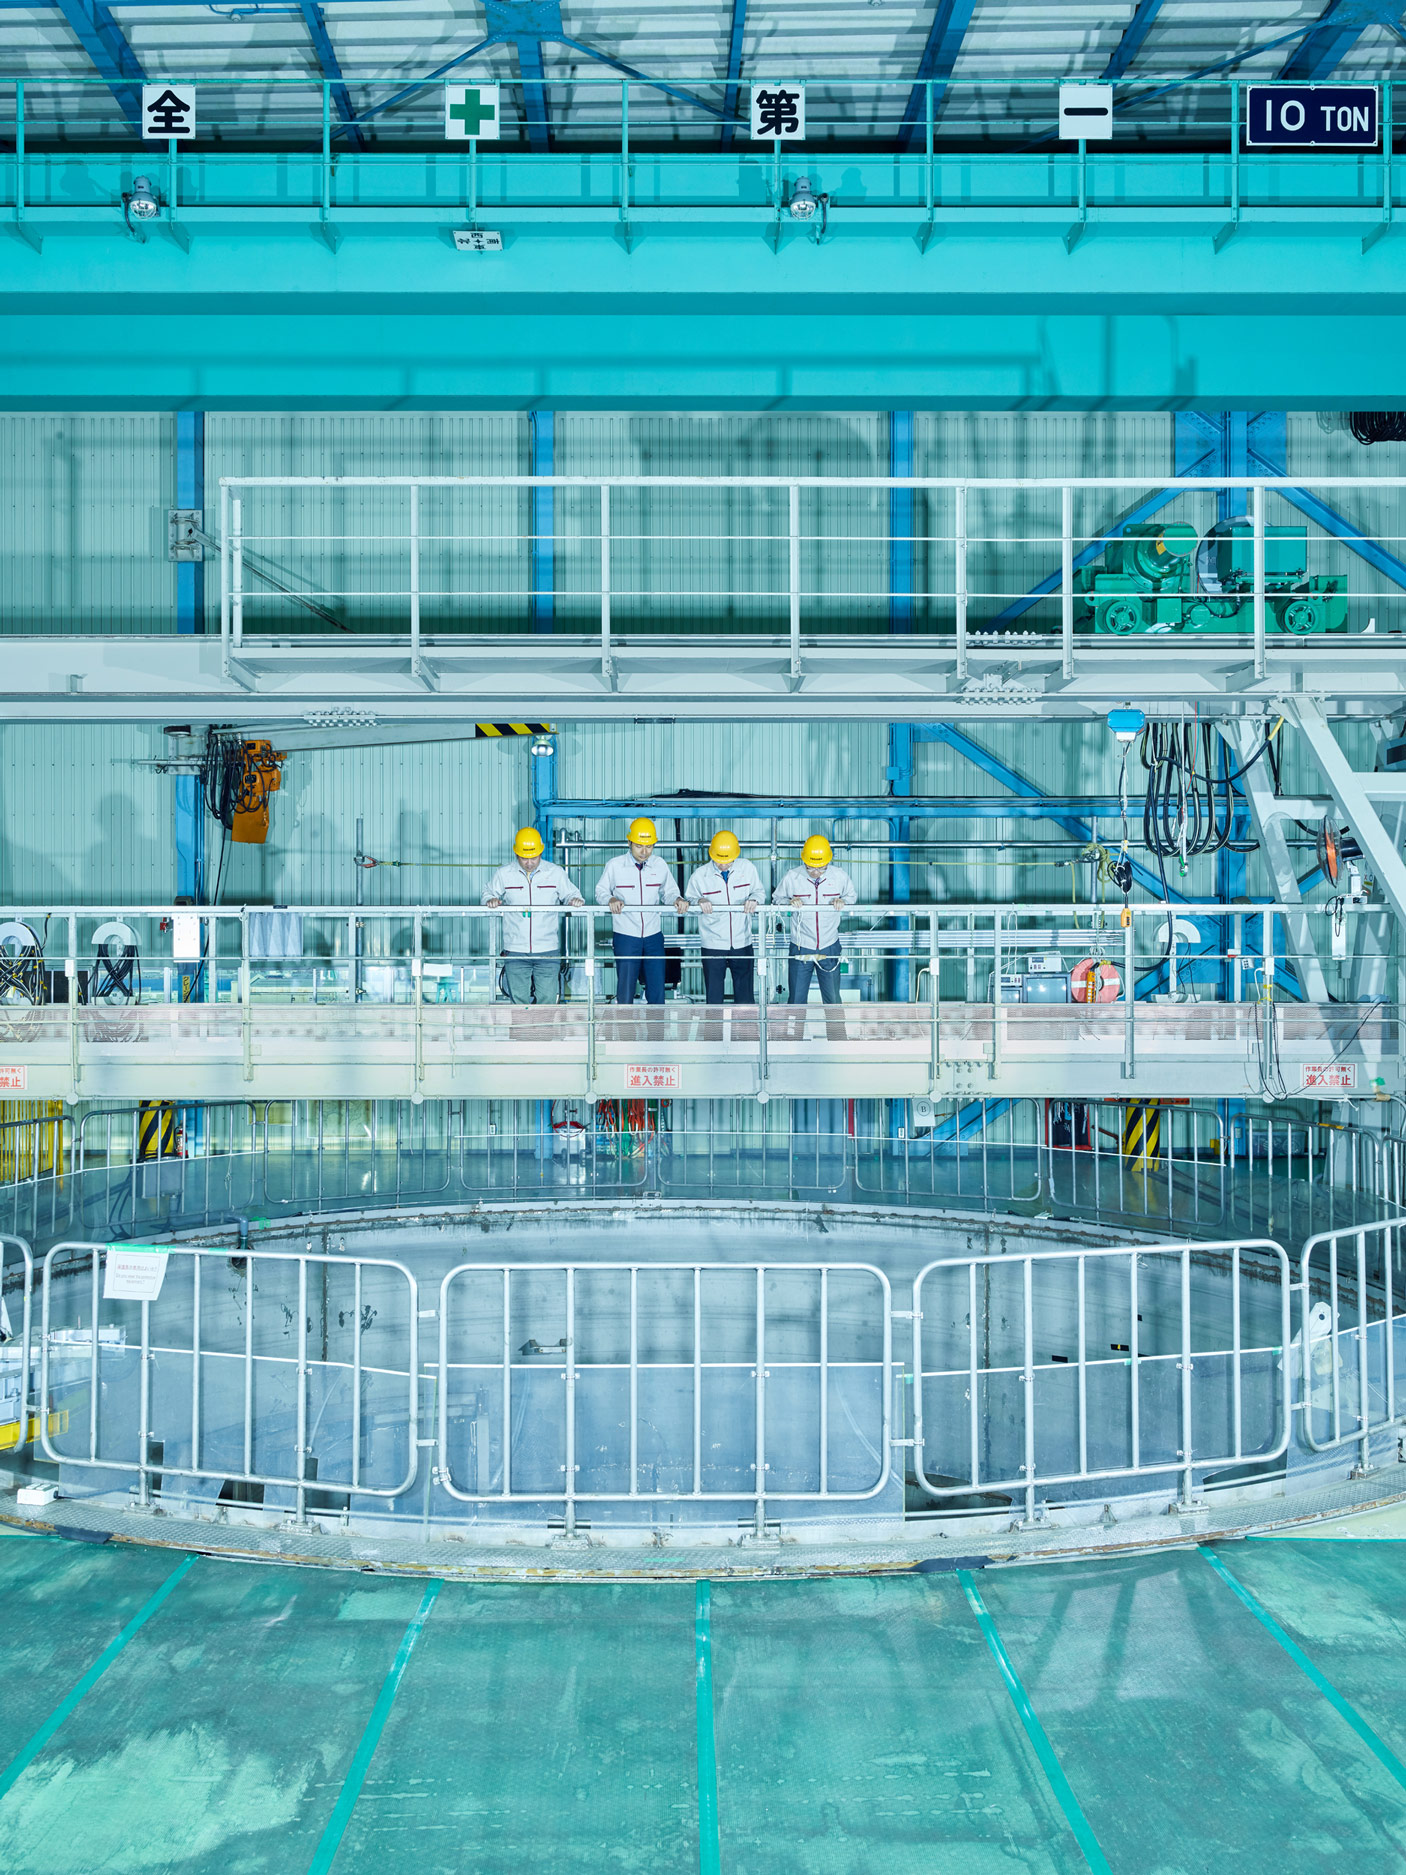 Toshiba's Nuclear Reactor Cleanup Research Facility, Kawasaki, Japan, 2017